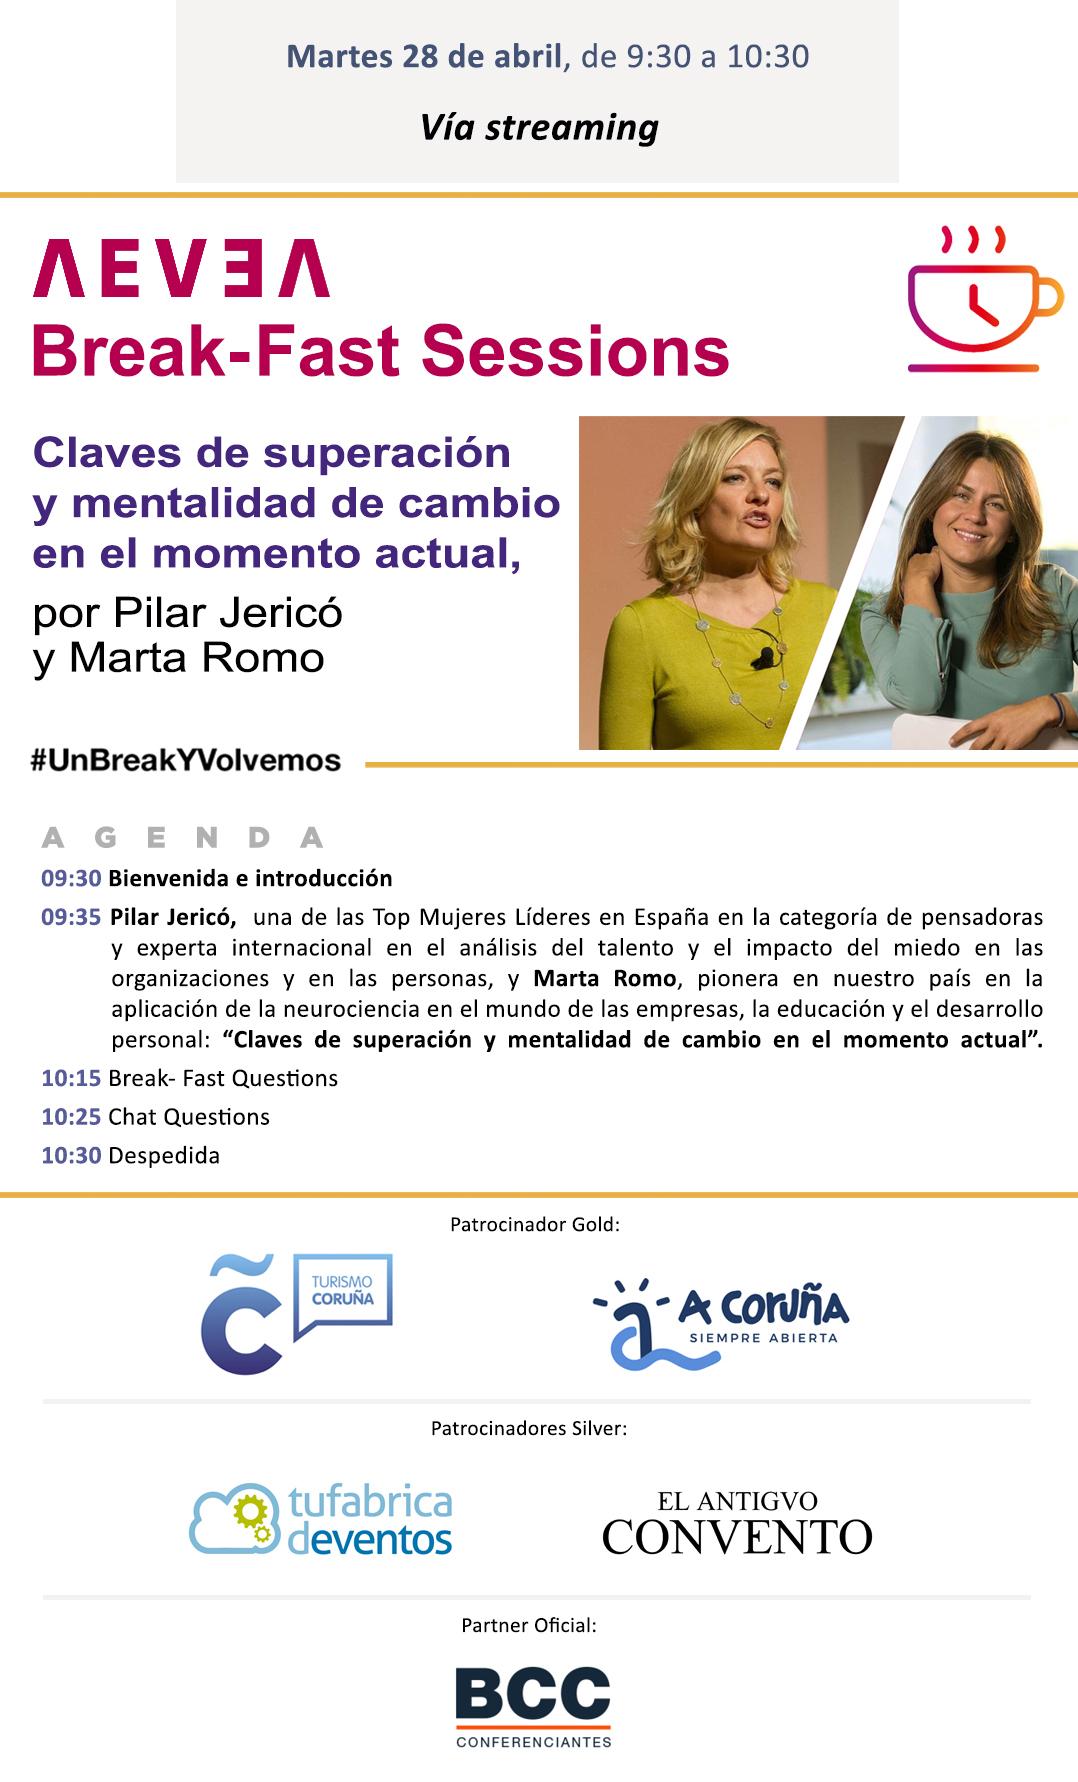 AEVEA Break-Fast Sessions